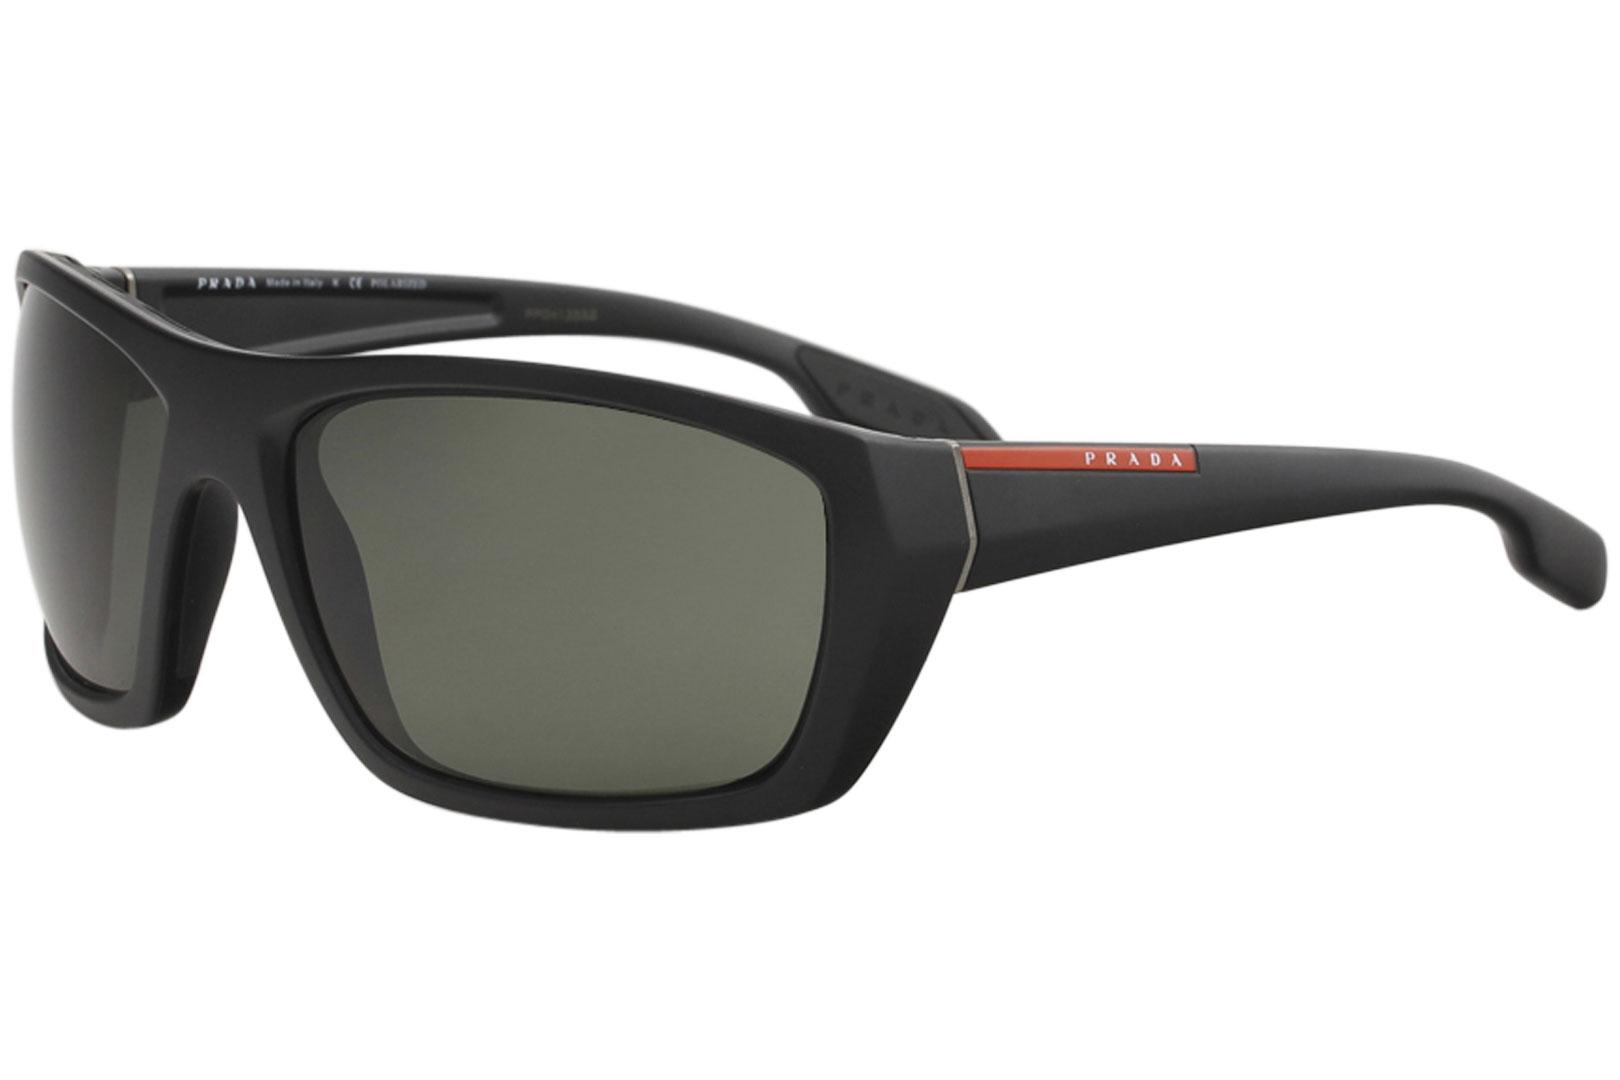 b164fe589d66 Prada Linea Rossa Men s SPS06S SPS 06S Fashion Rectangle Polarized  Sunglasses